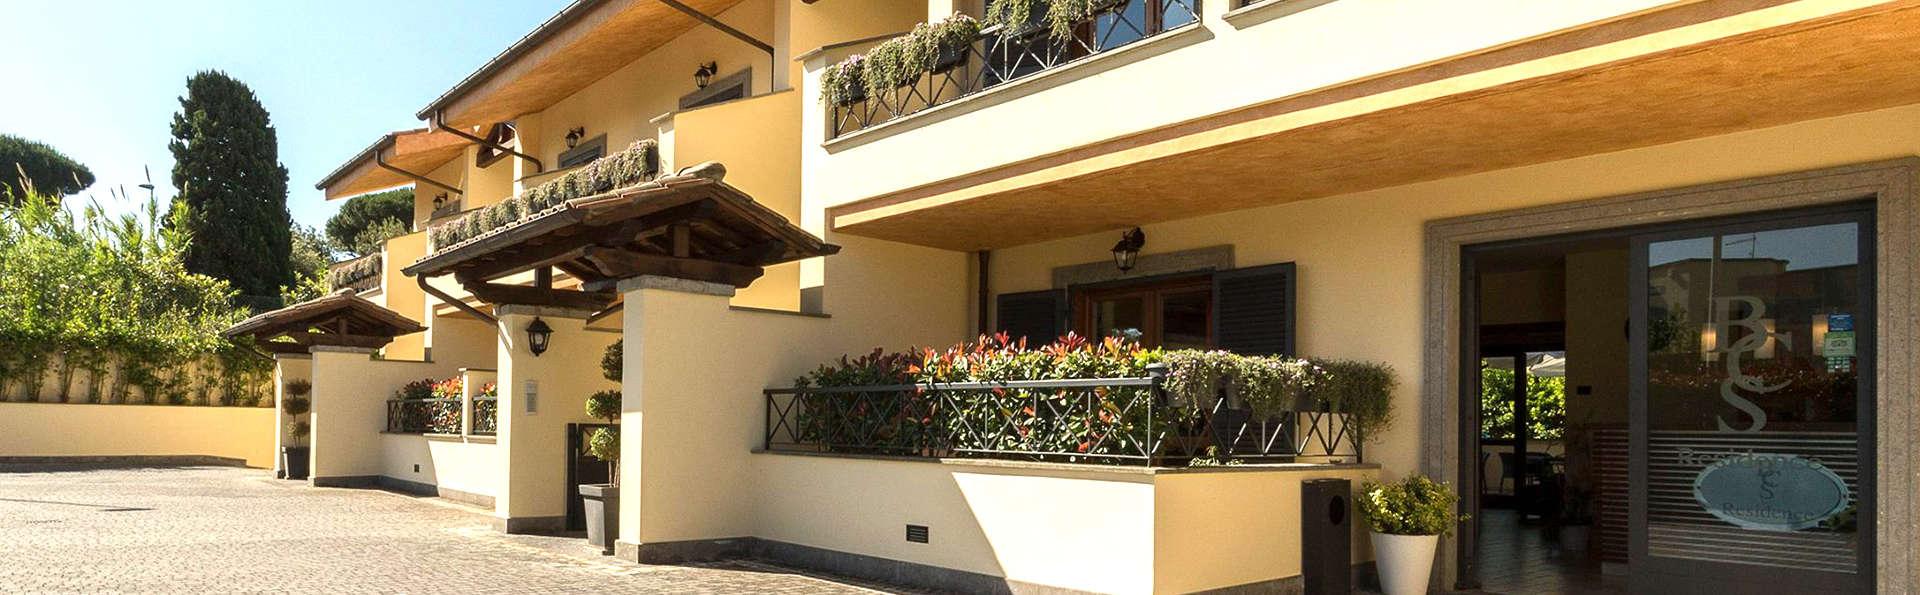 Borgo Castel Savelli - Edit_Front.jpg